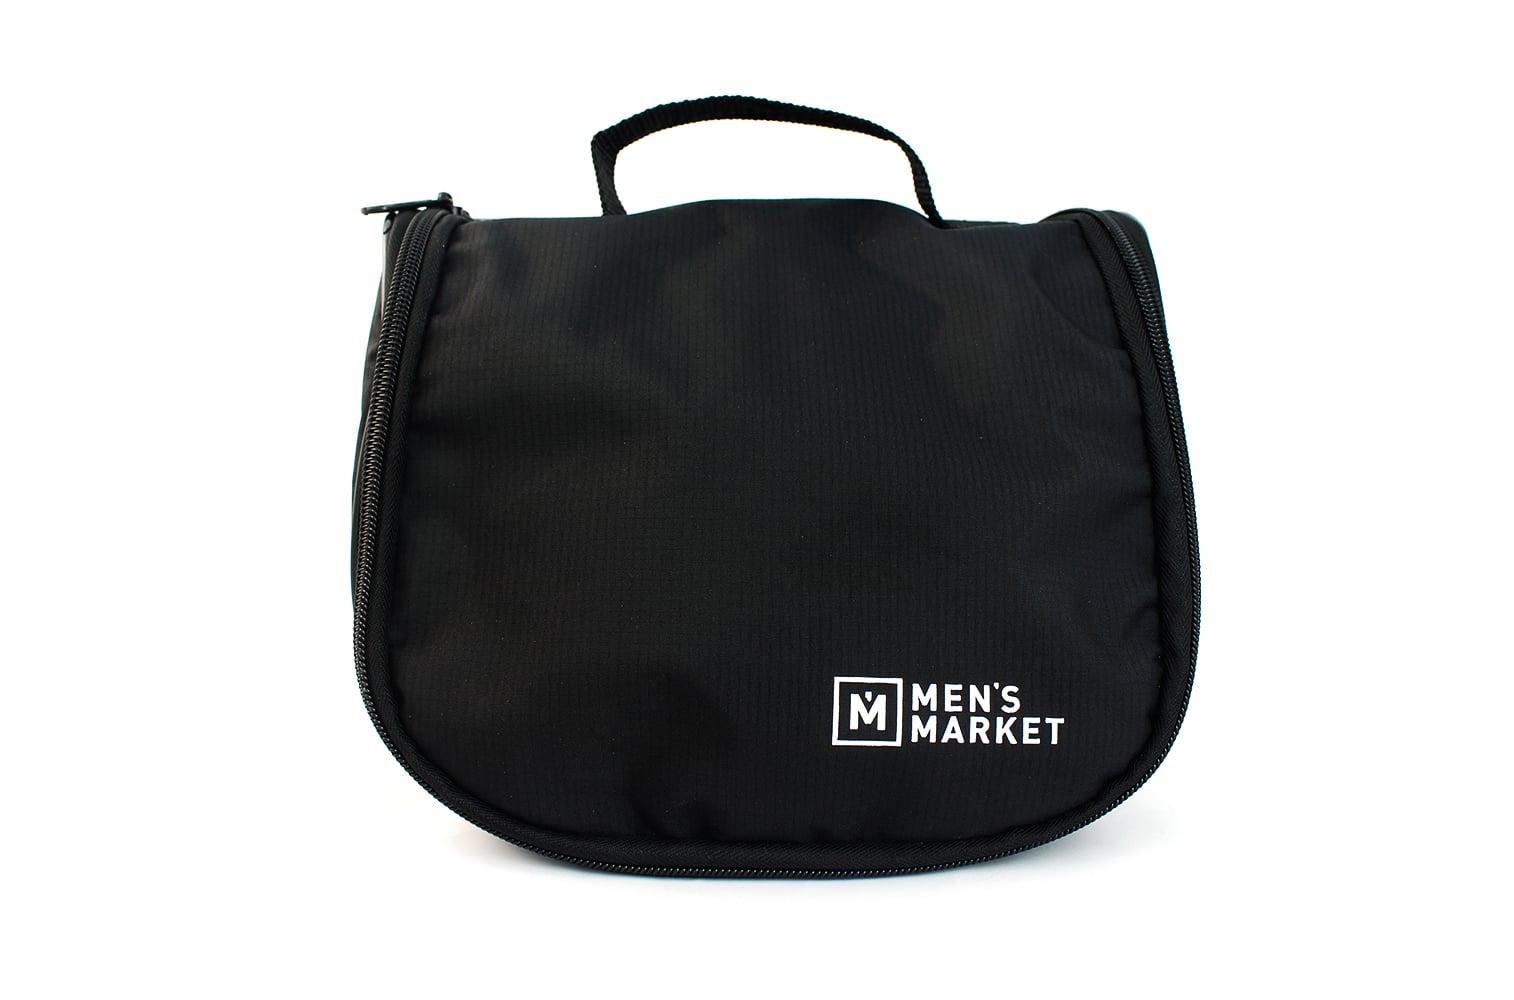 necessaire-mens-market-homens-que-se-cuidam-copy